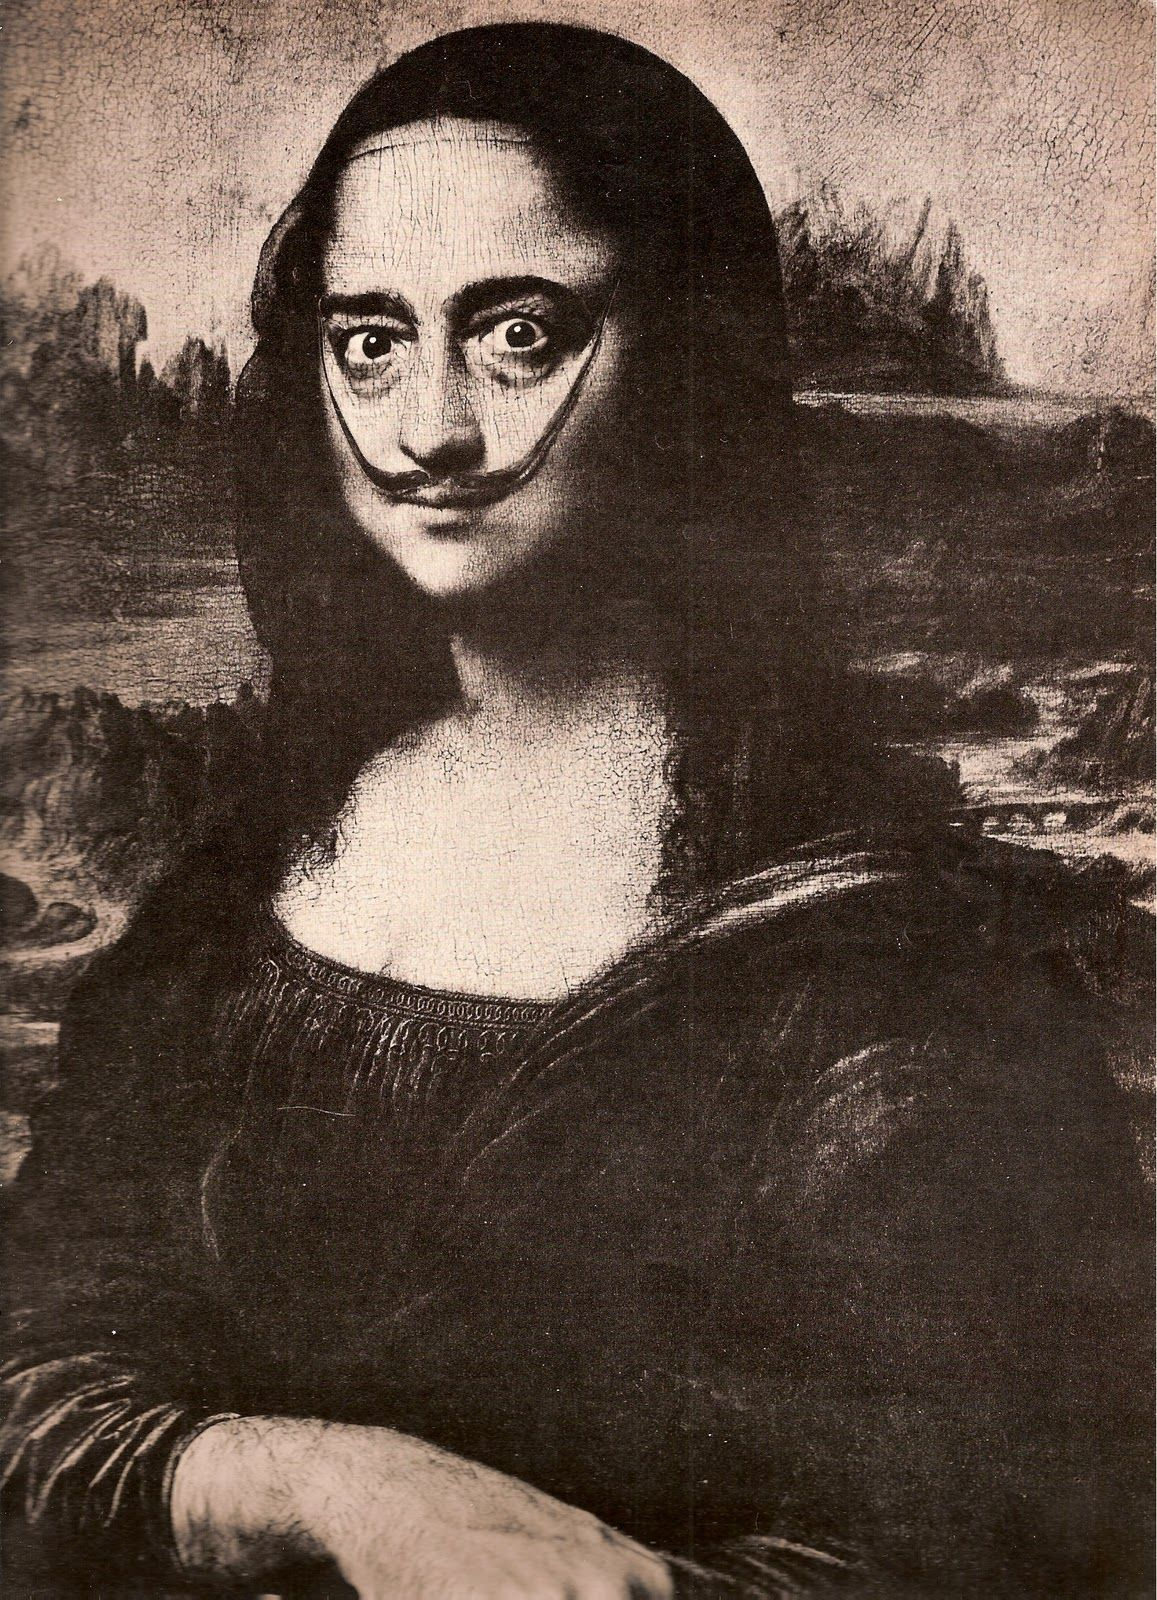 Mona Lisa As Salvador Dali Mona Lisa Parody Mona Lisa Art Parody